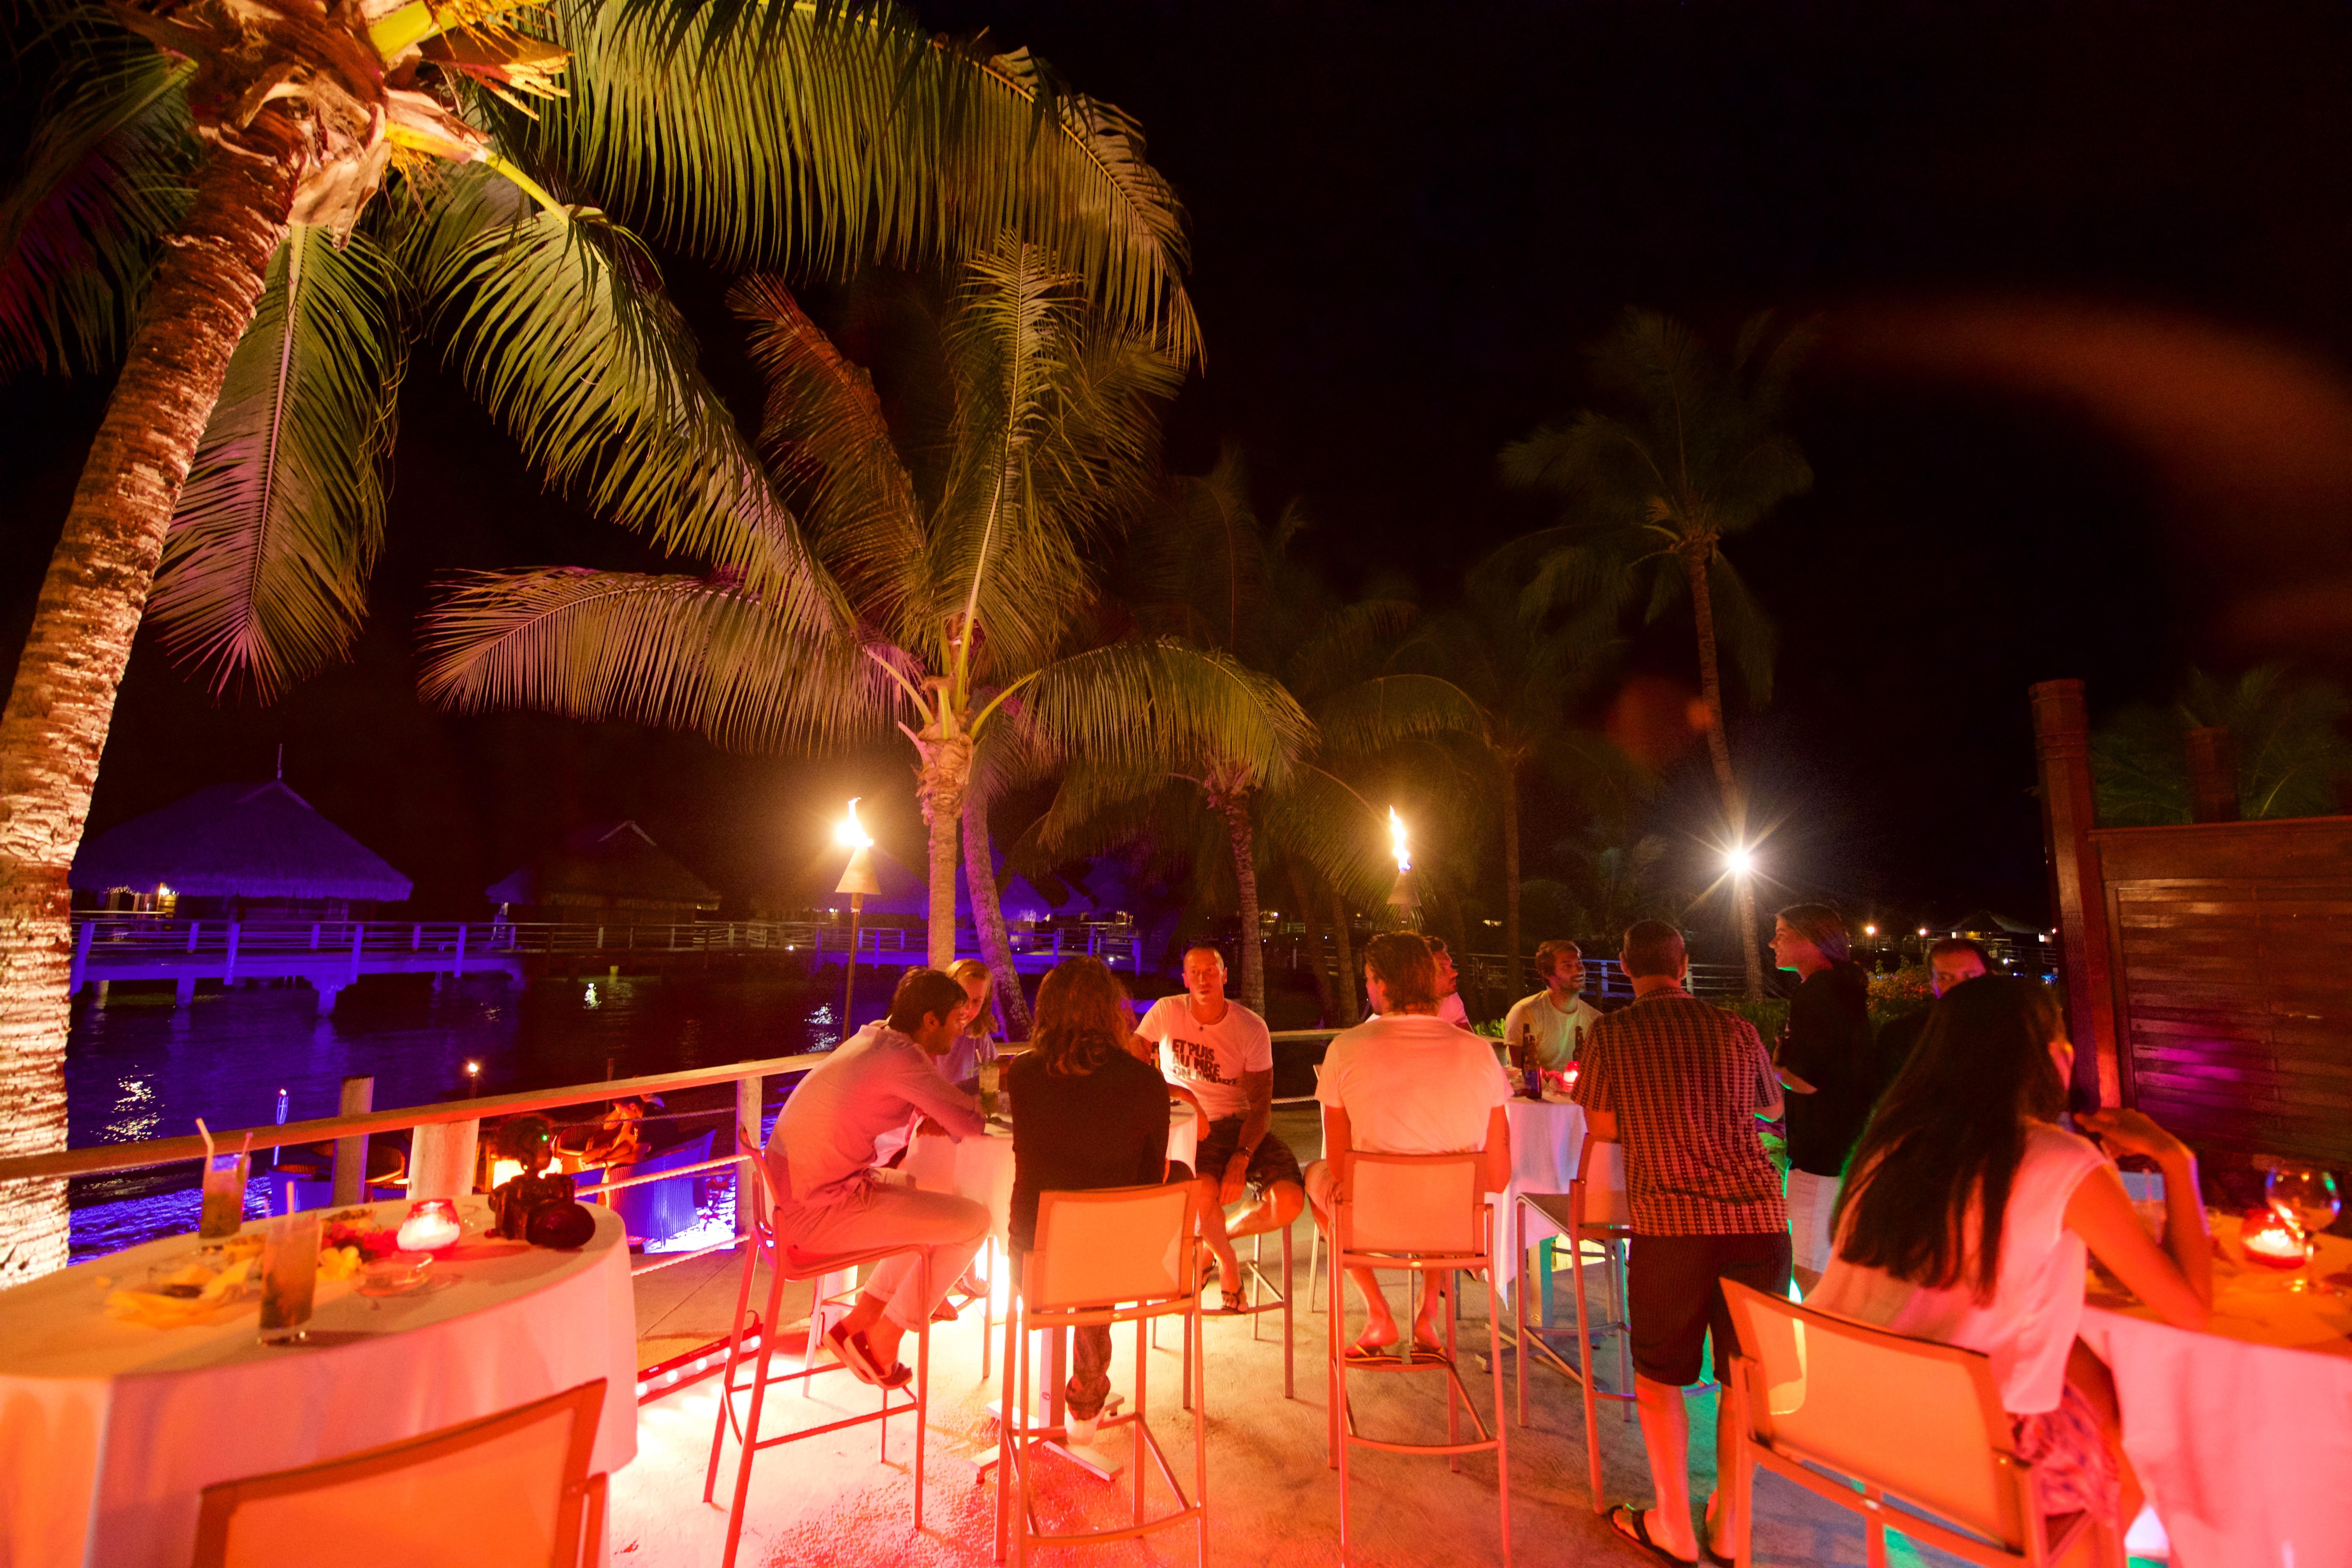 https://tahititourisme.mx/wp-content/uploads/2018/03/RESTAURATION-Matahiehani-Lounge-Bar-featured_image-Tim_McKenna.jpg